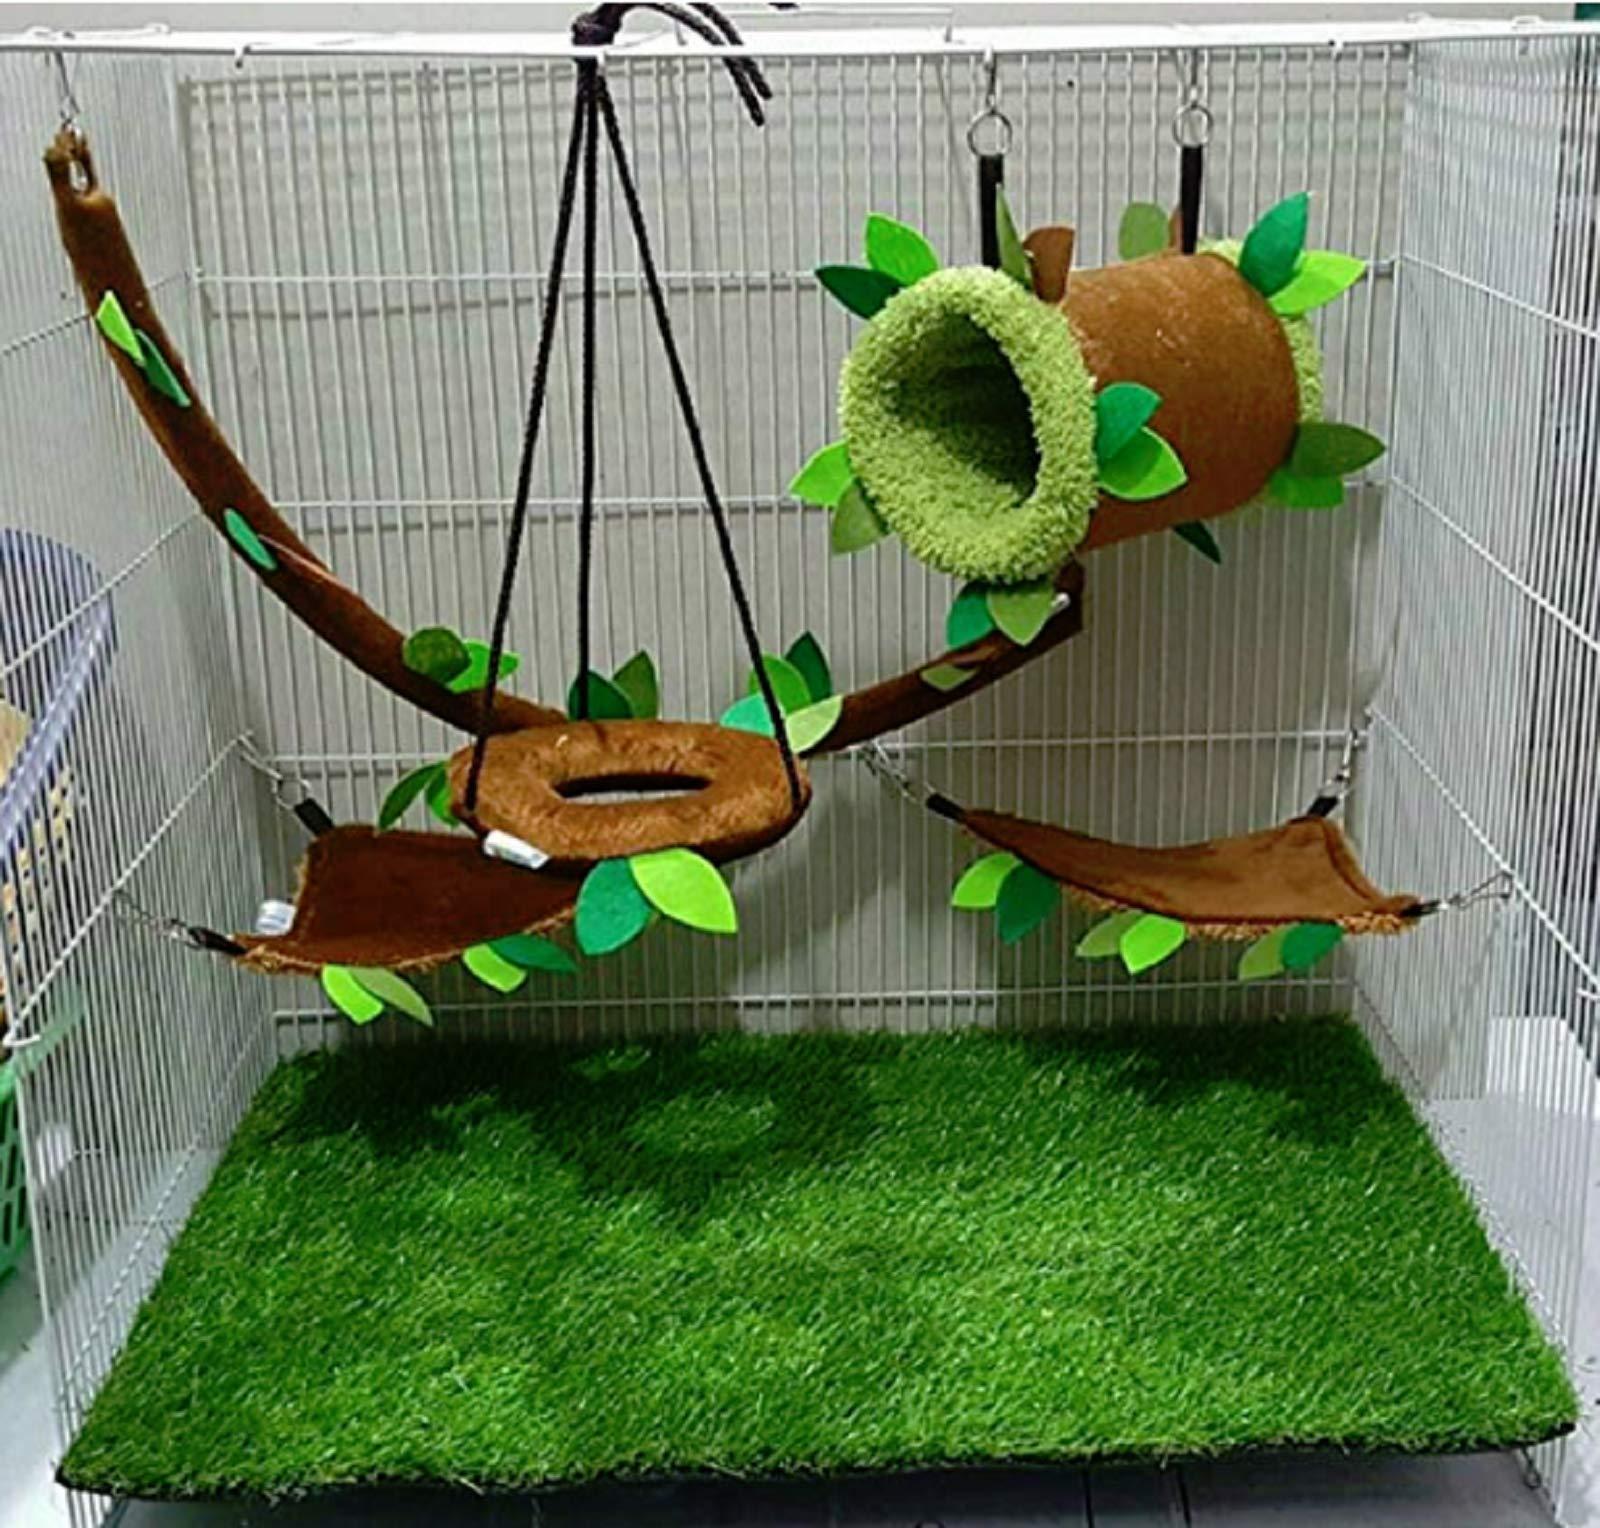 Hot Sale! 5 piece KPS Cute Sugar Glider Hamster Squirrel Small Pet Cage Set Forest Pattern Light Brown, Polar Bear's Republic